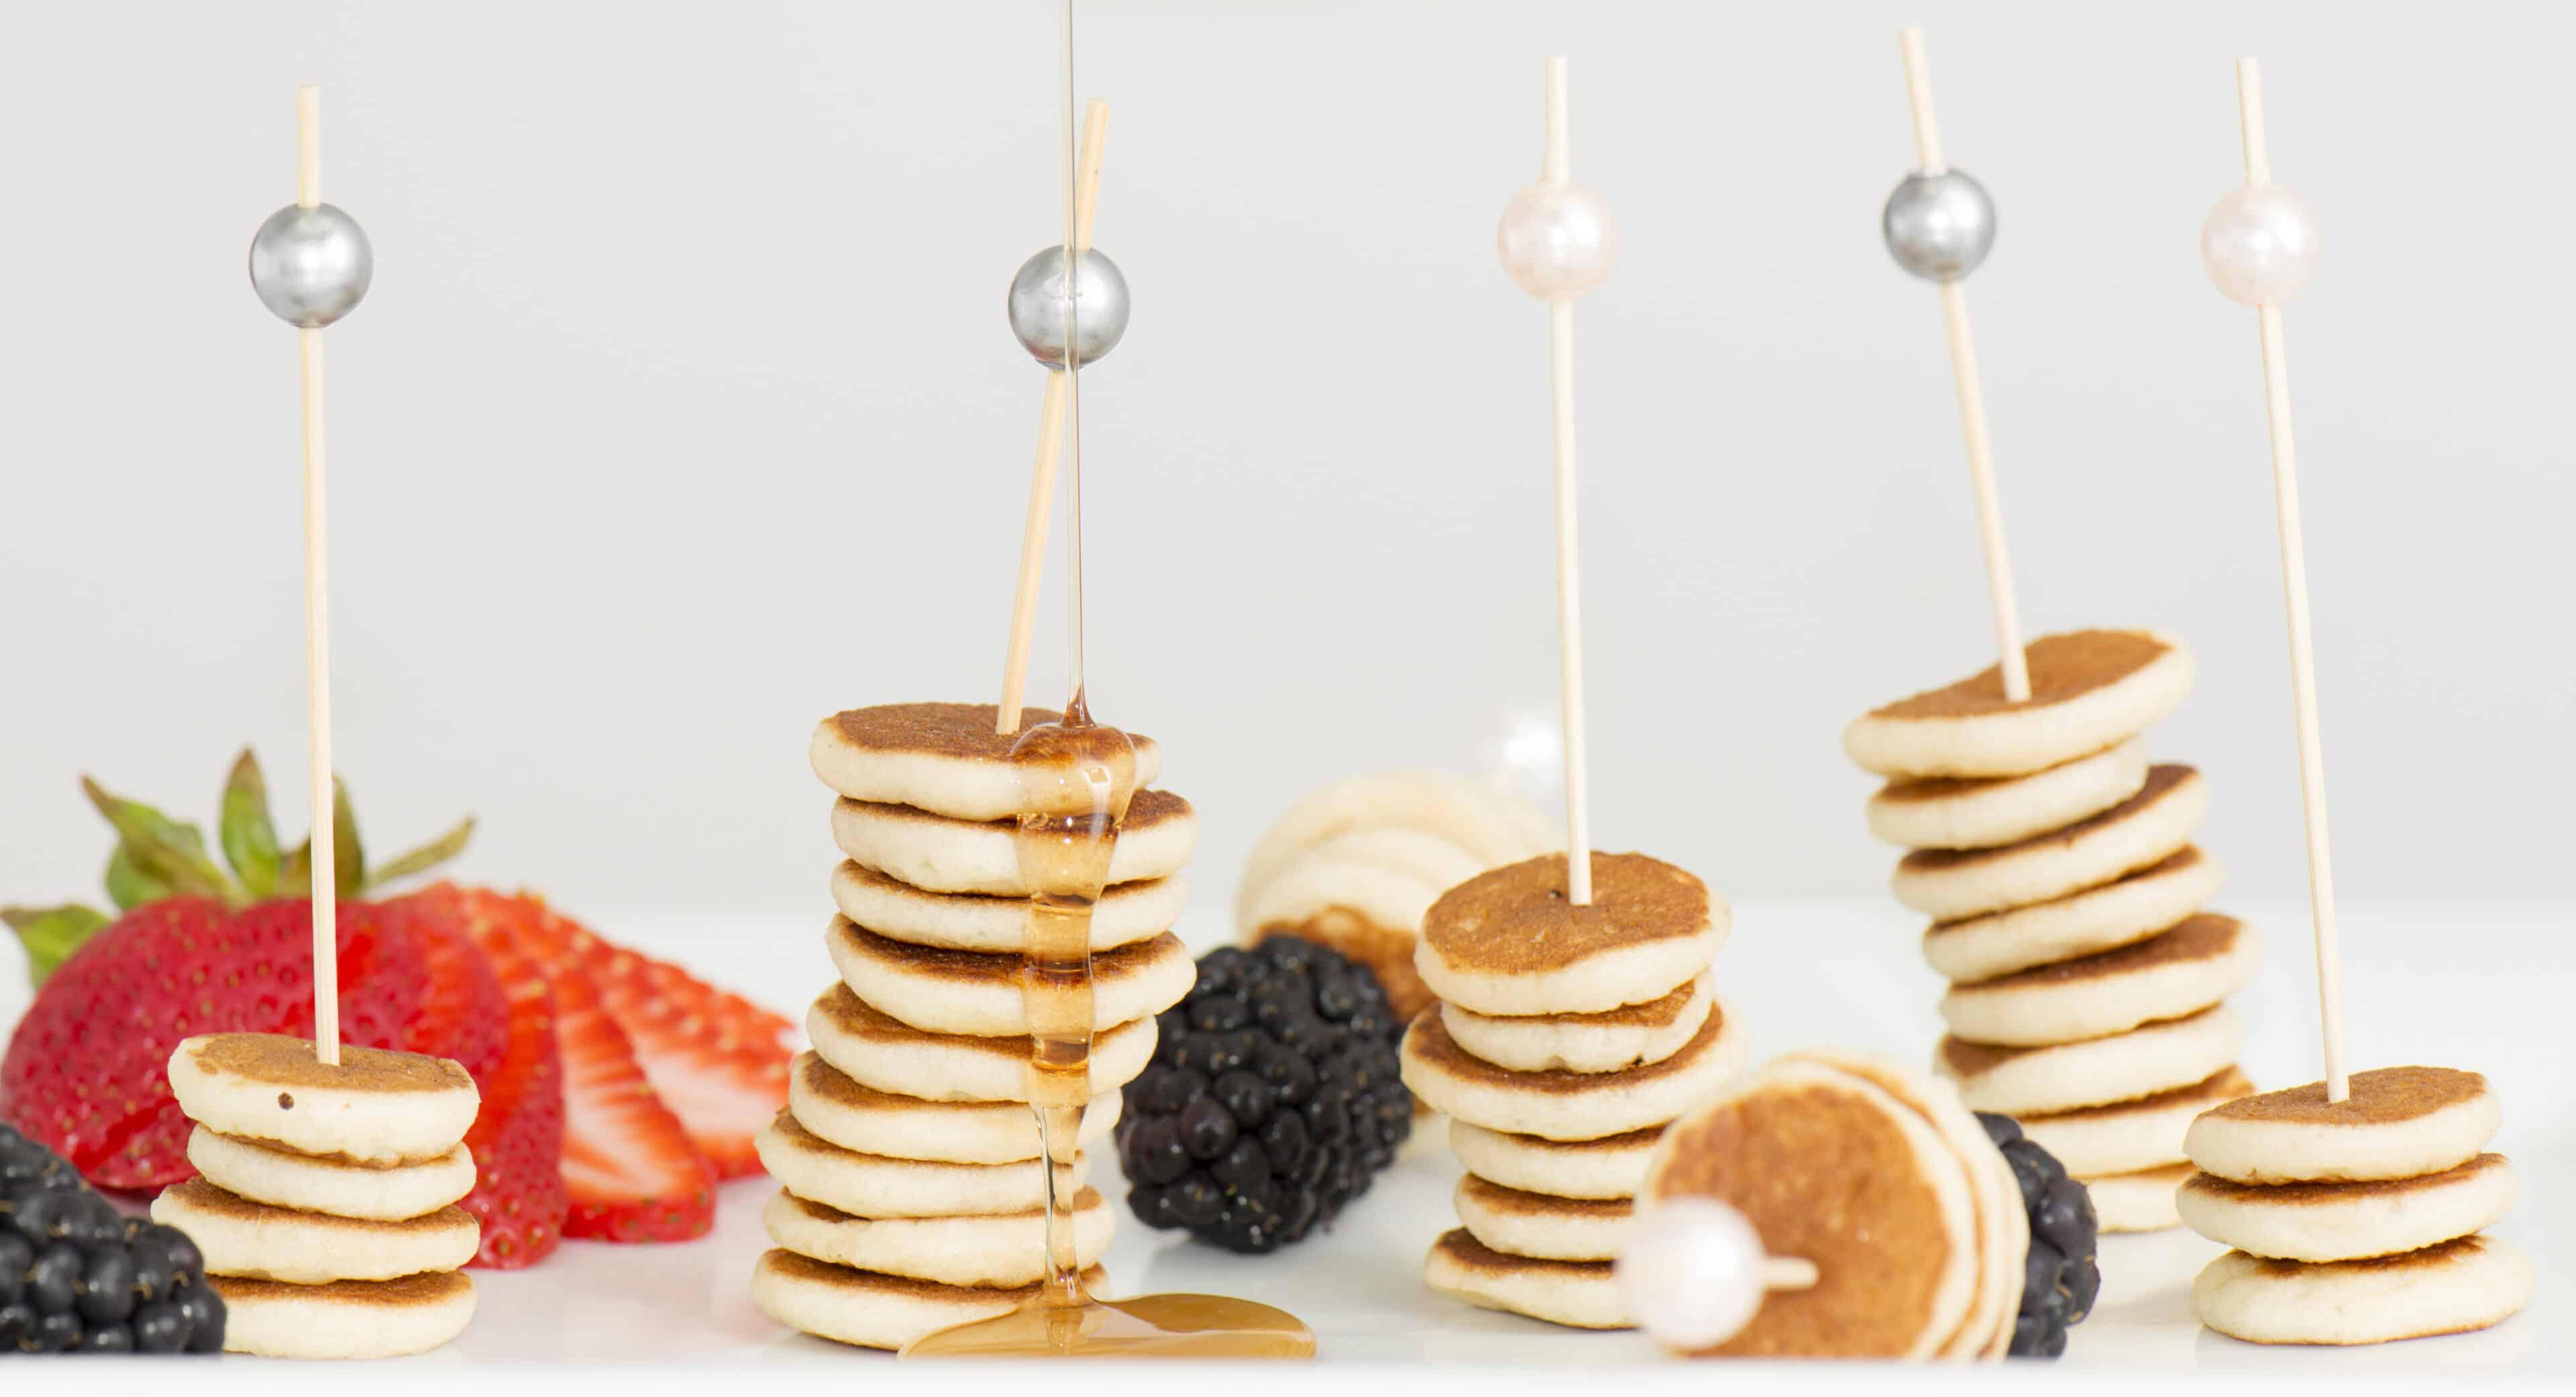 Mini stack of pancakes